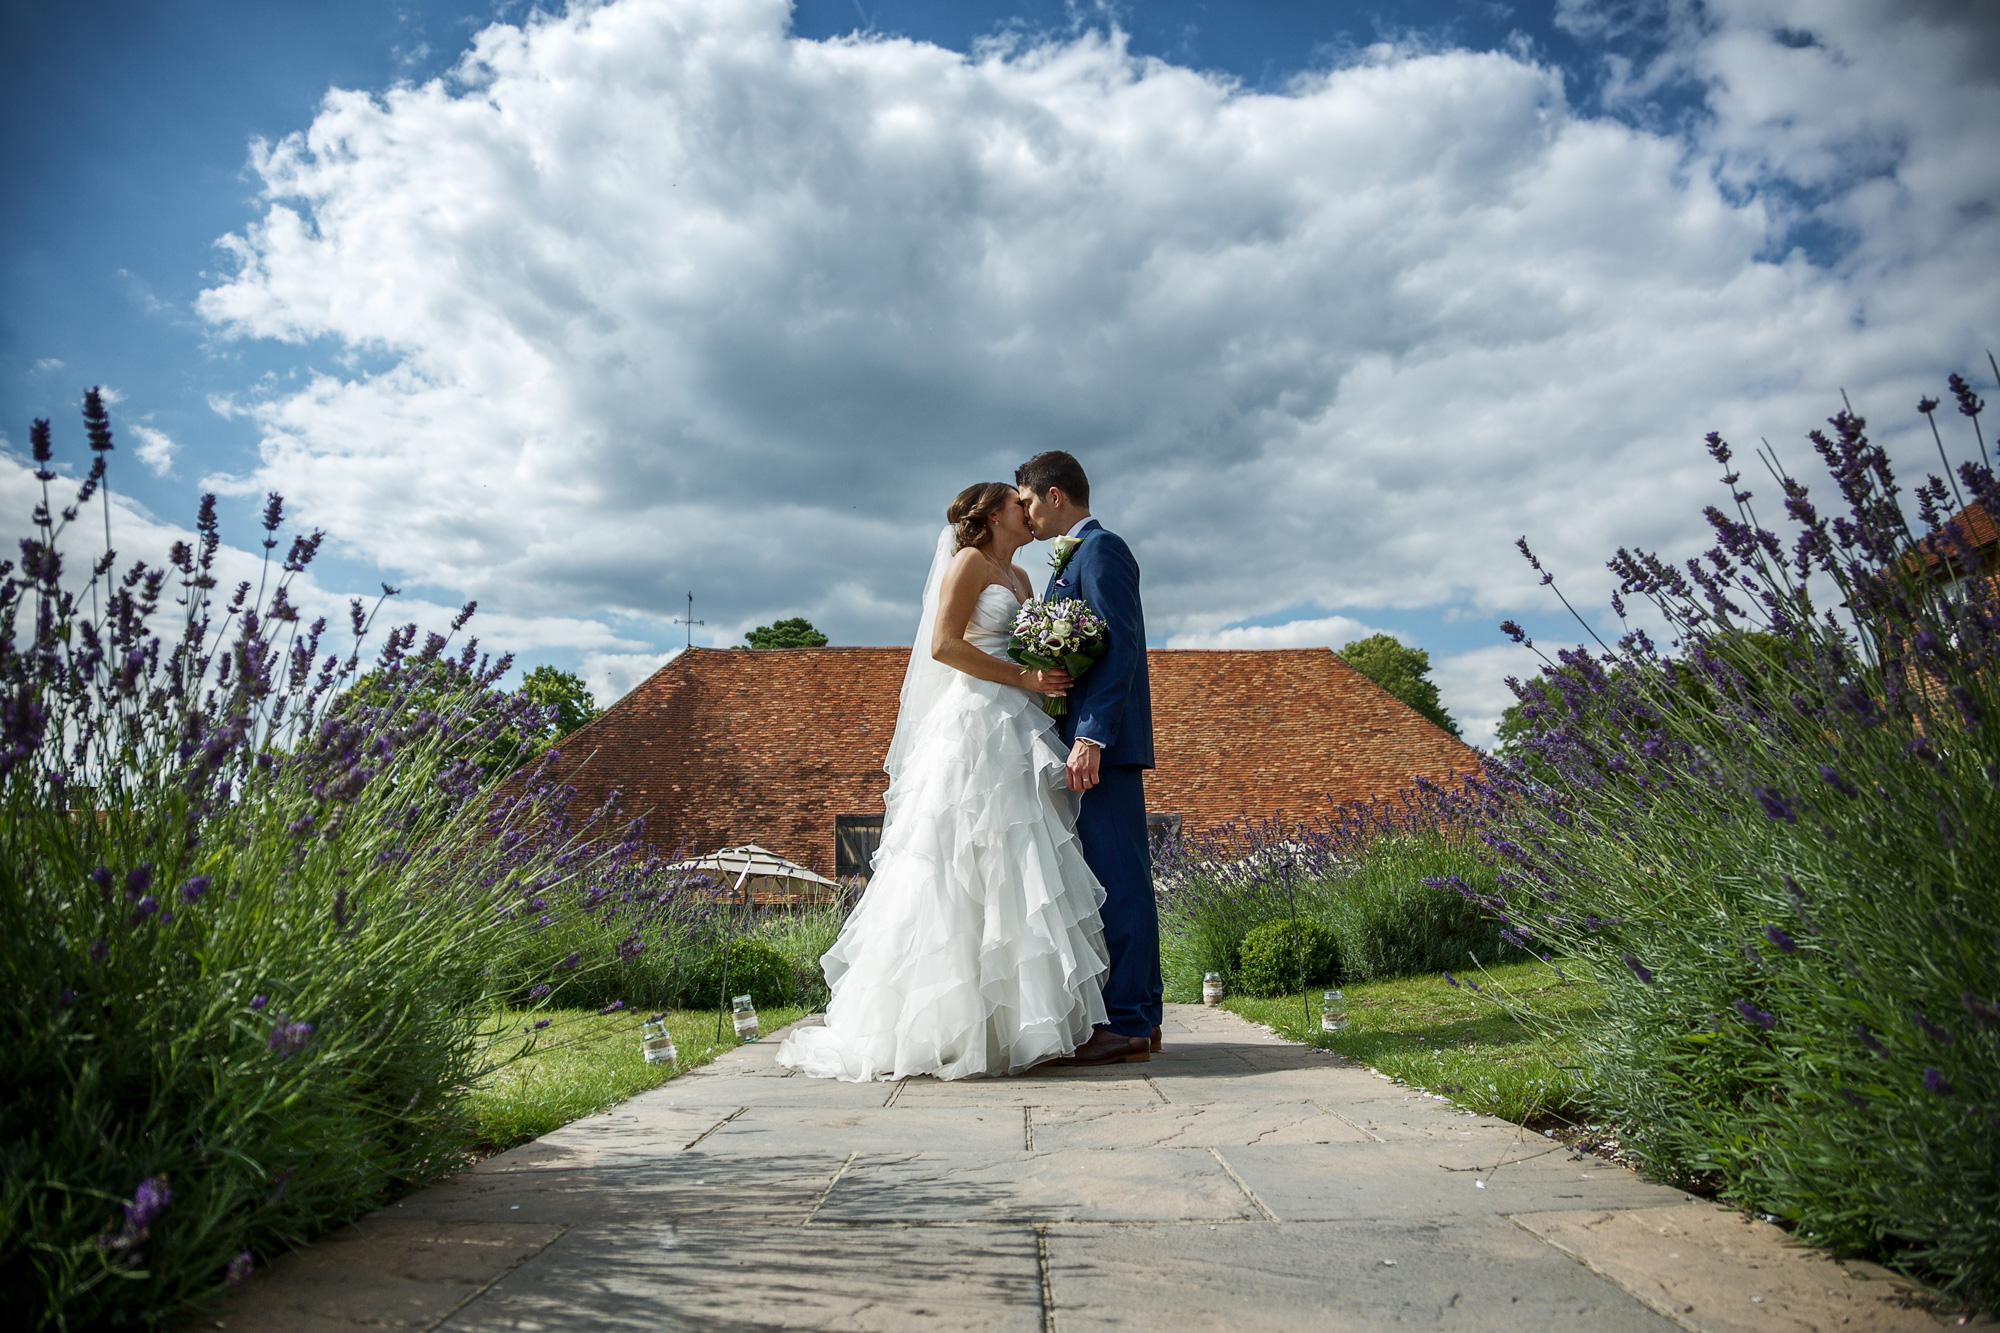 Adam_Hillier_Wedding_Photographer_Newbury_Berkshire_0 (6).jpg